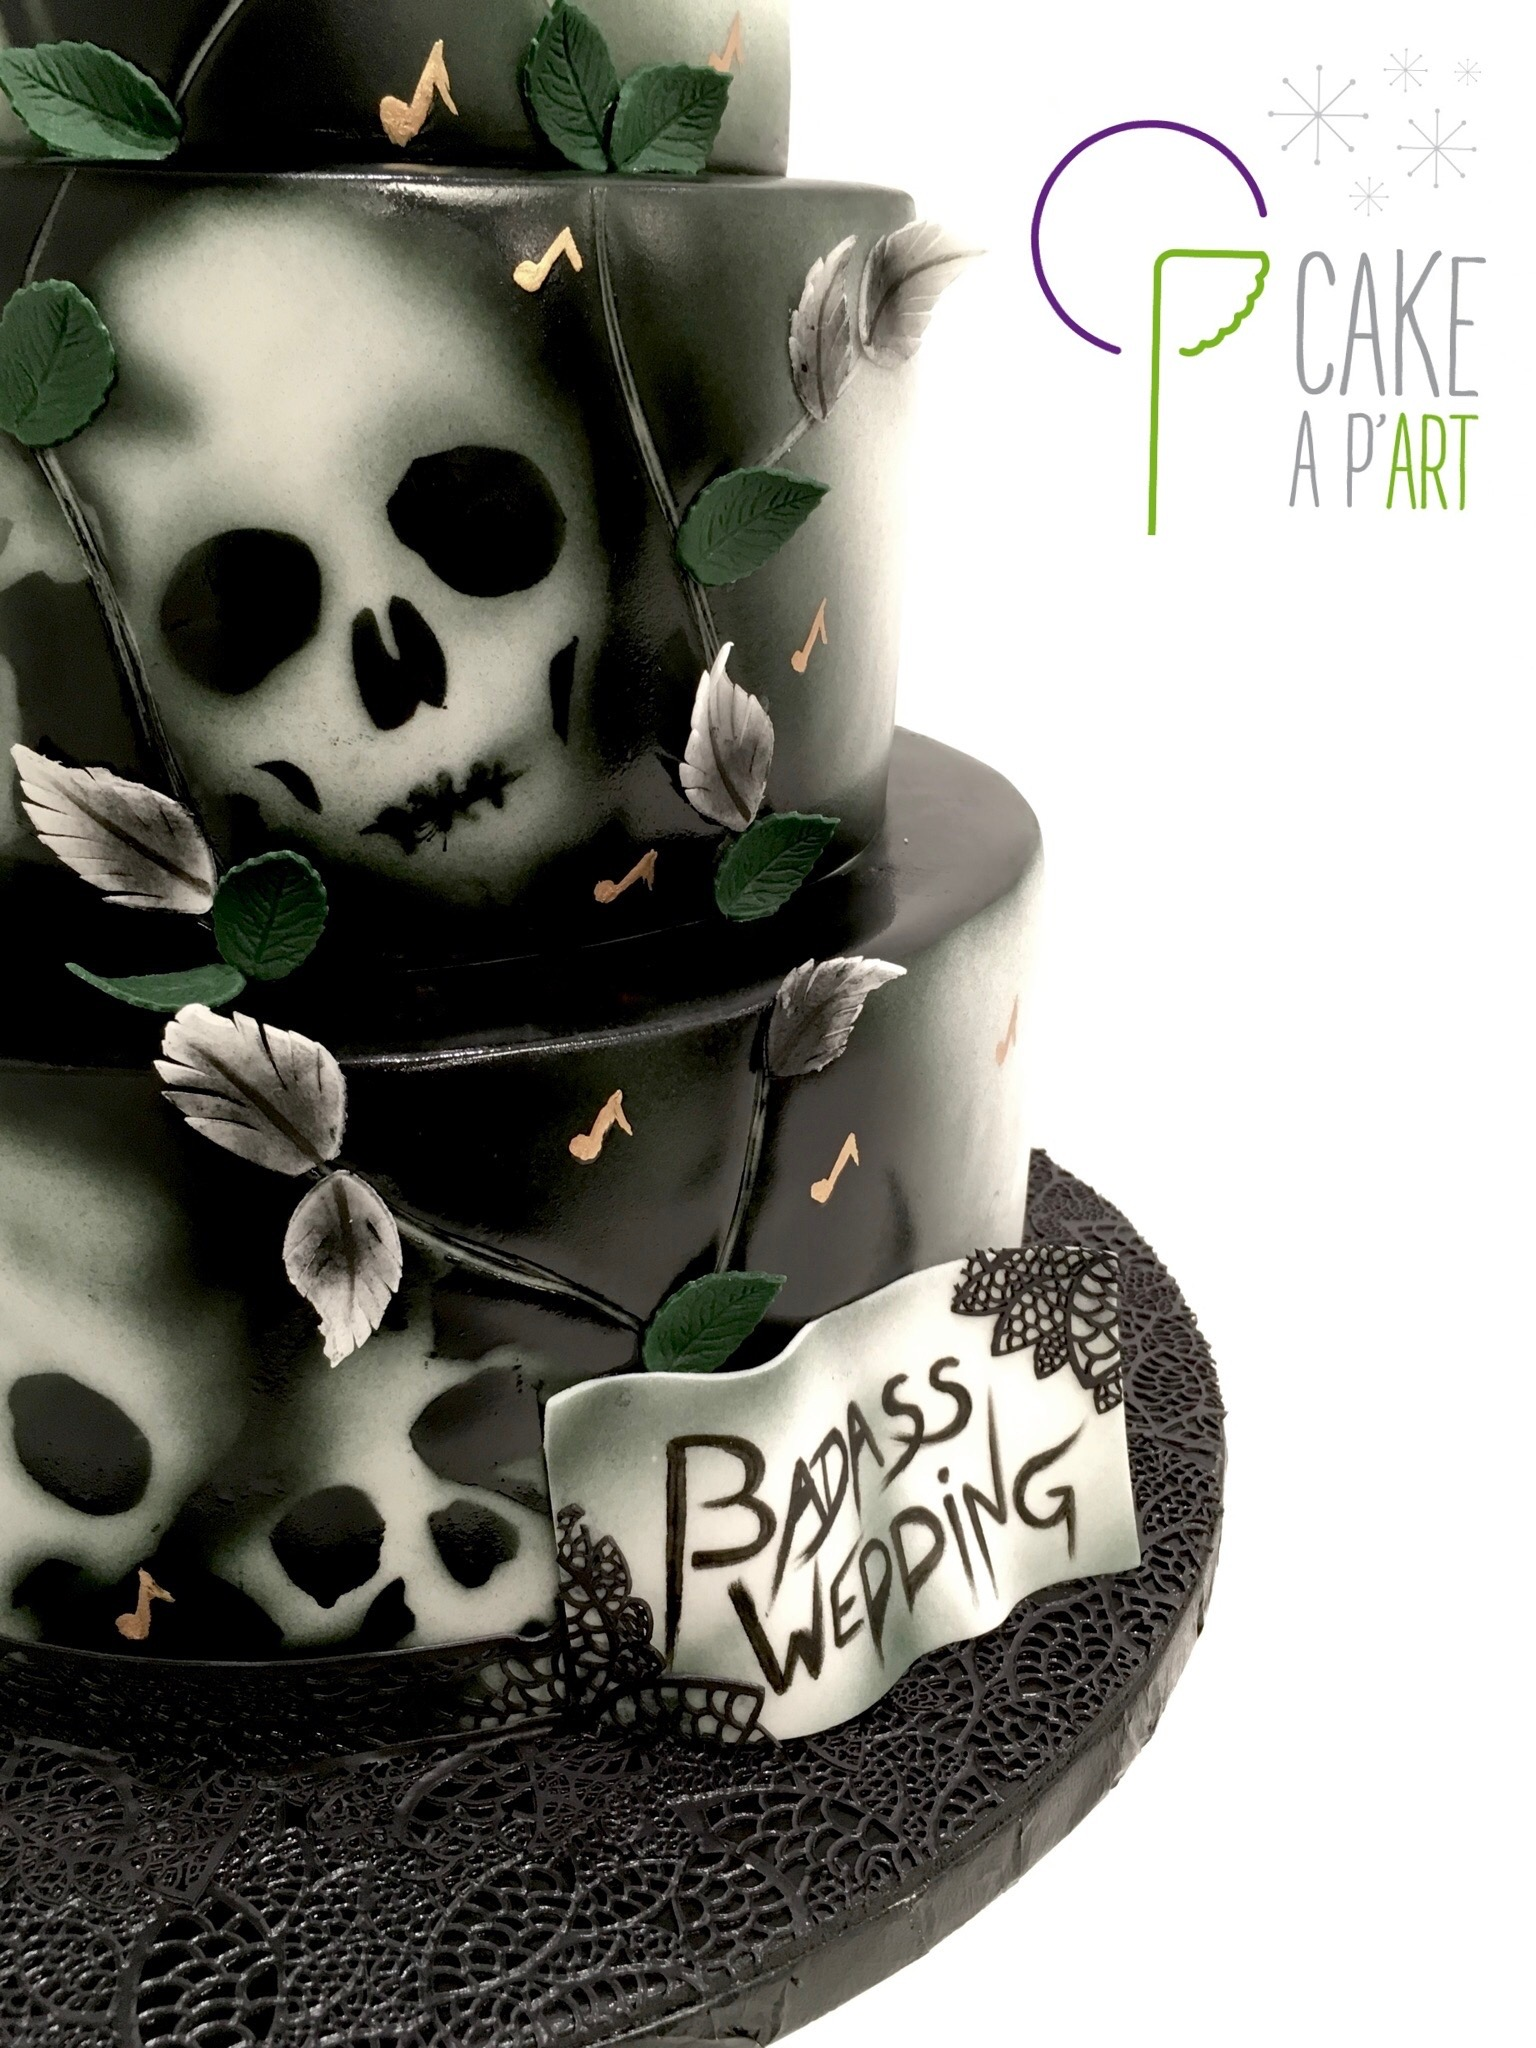 Wedding Cake Pièce montée Mariage - Thème Badass Wedding Hard Rock et tête de mort